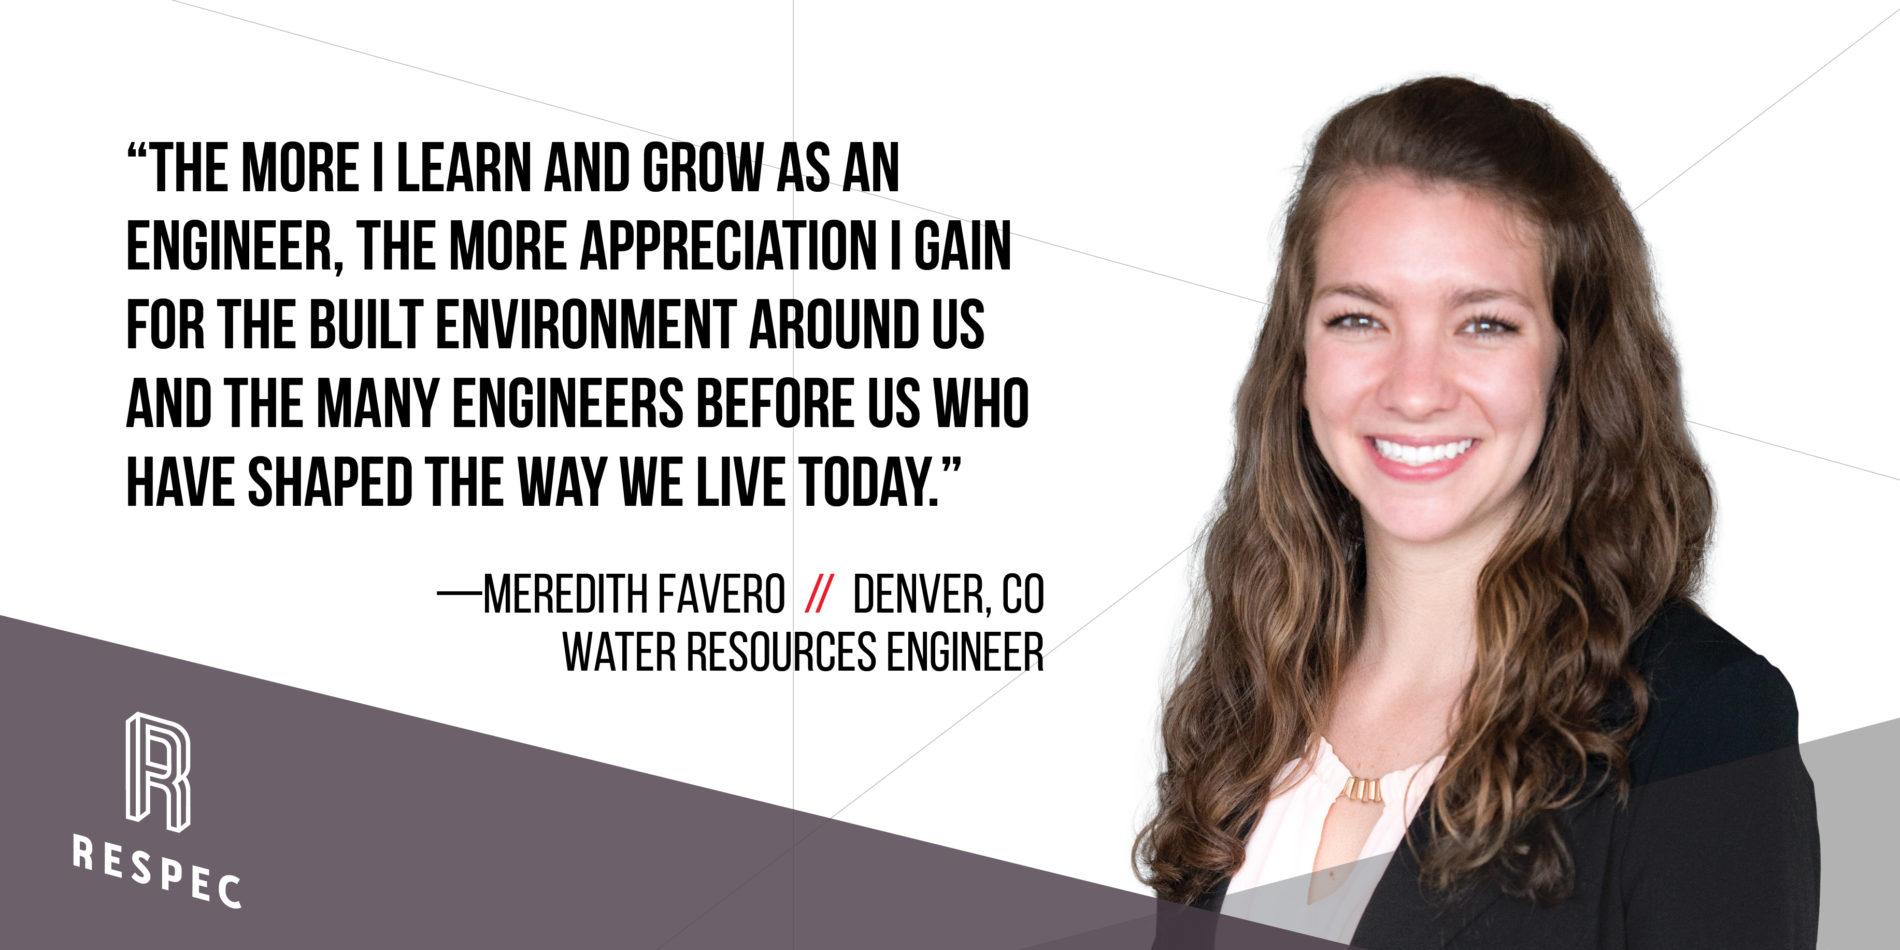 Meredith Favero